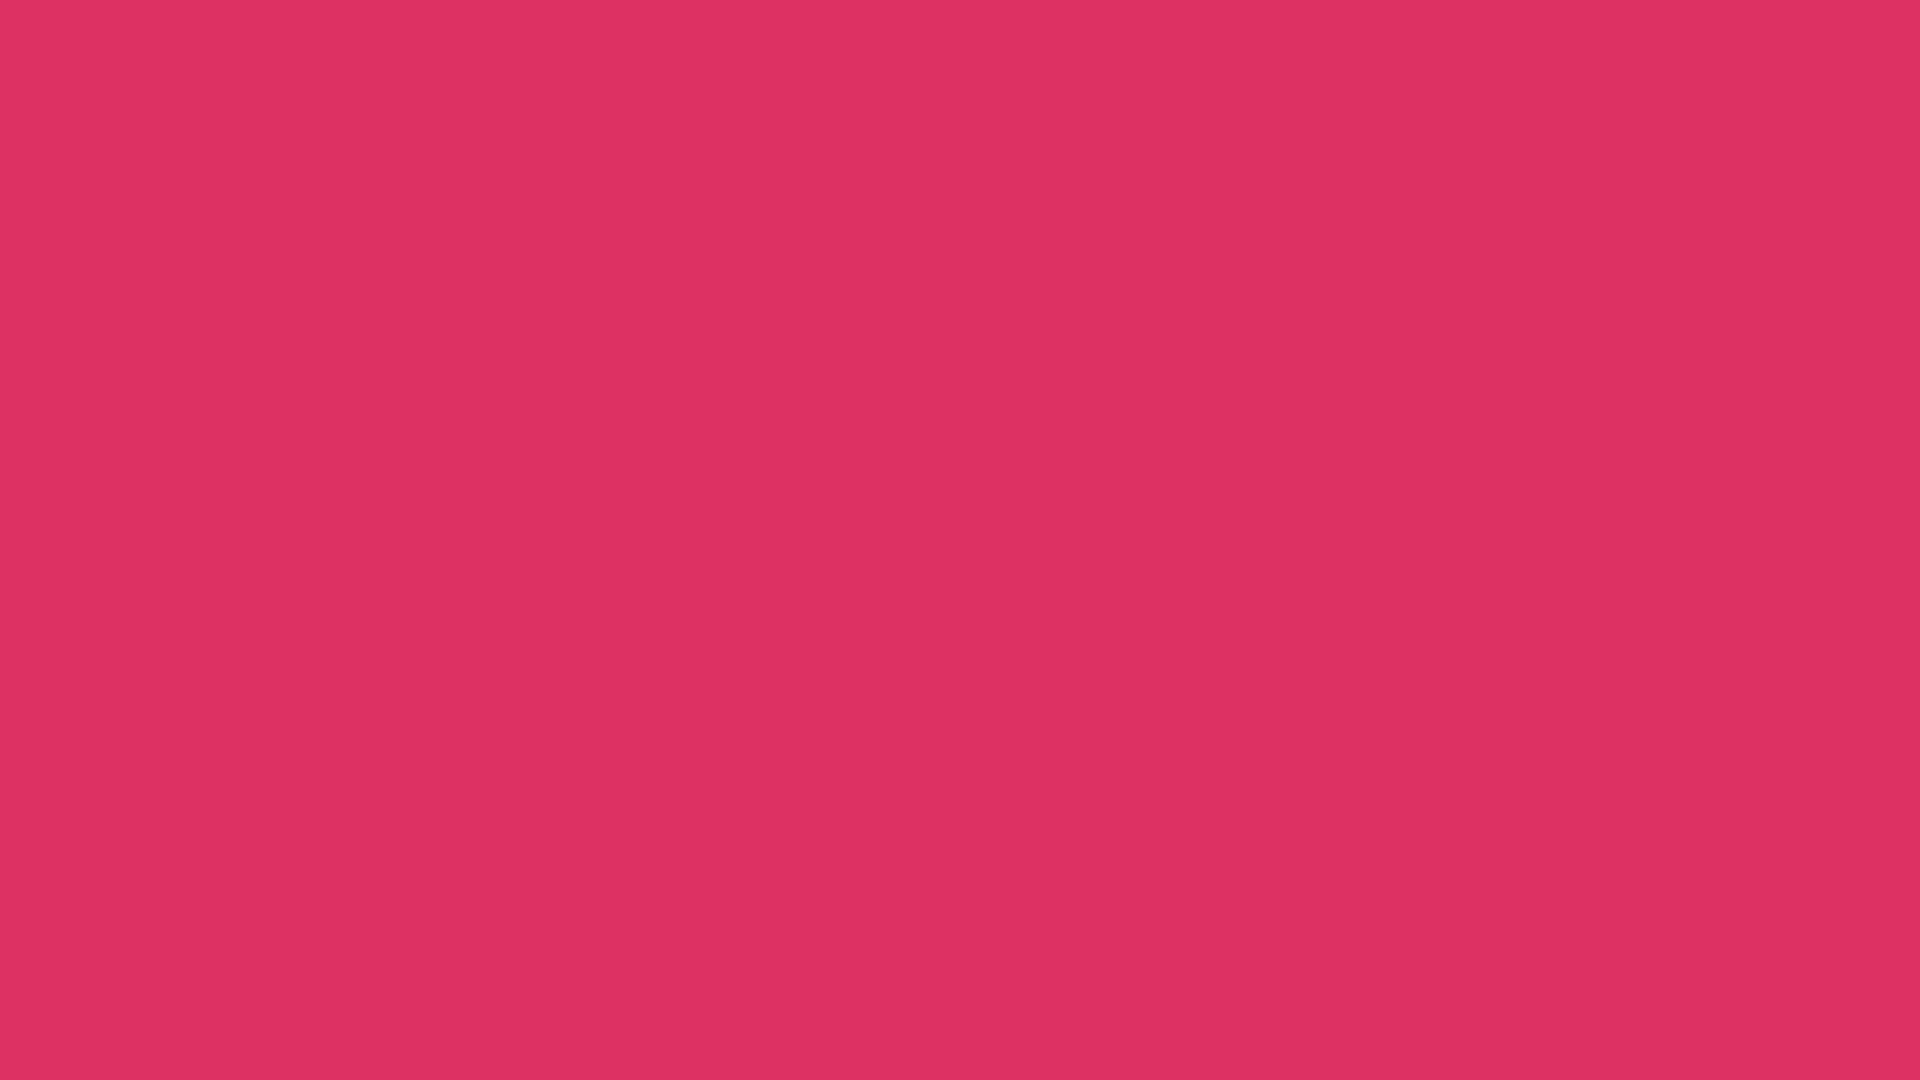 1920x1080 Cerise Solid Color Background